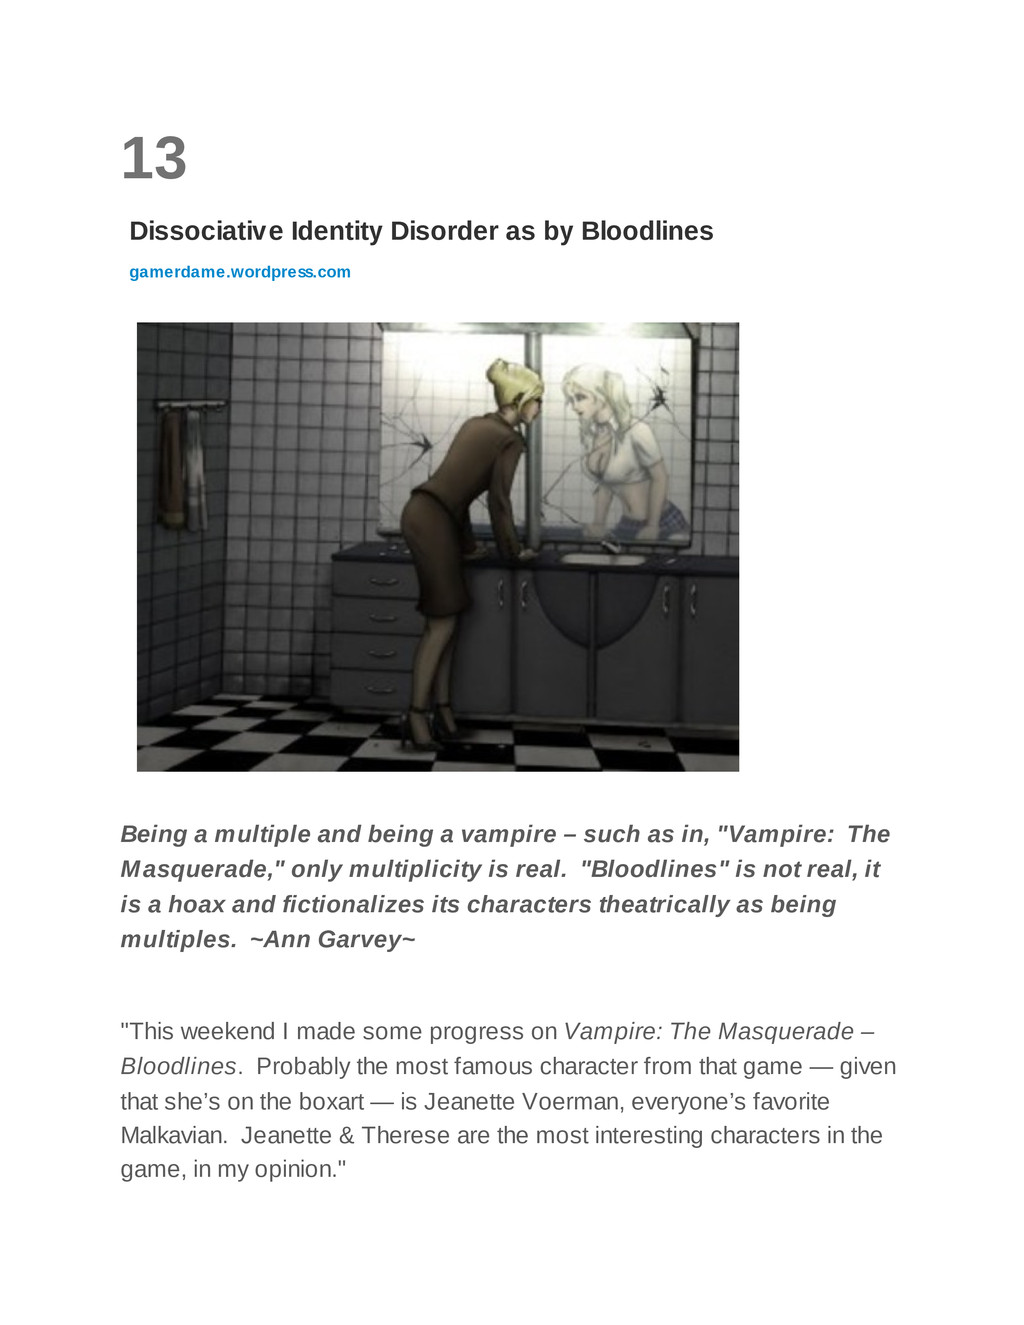 13 Dissociative Identity Disorder as by Bloodli...